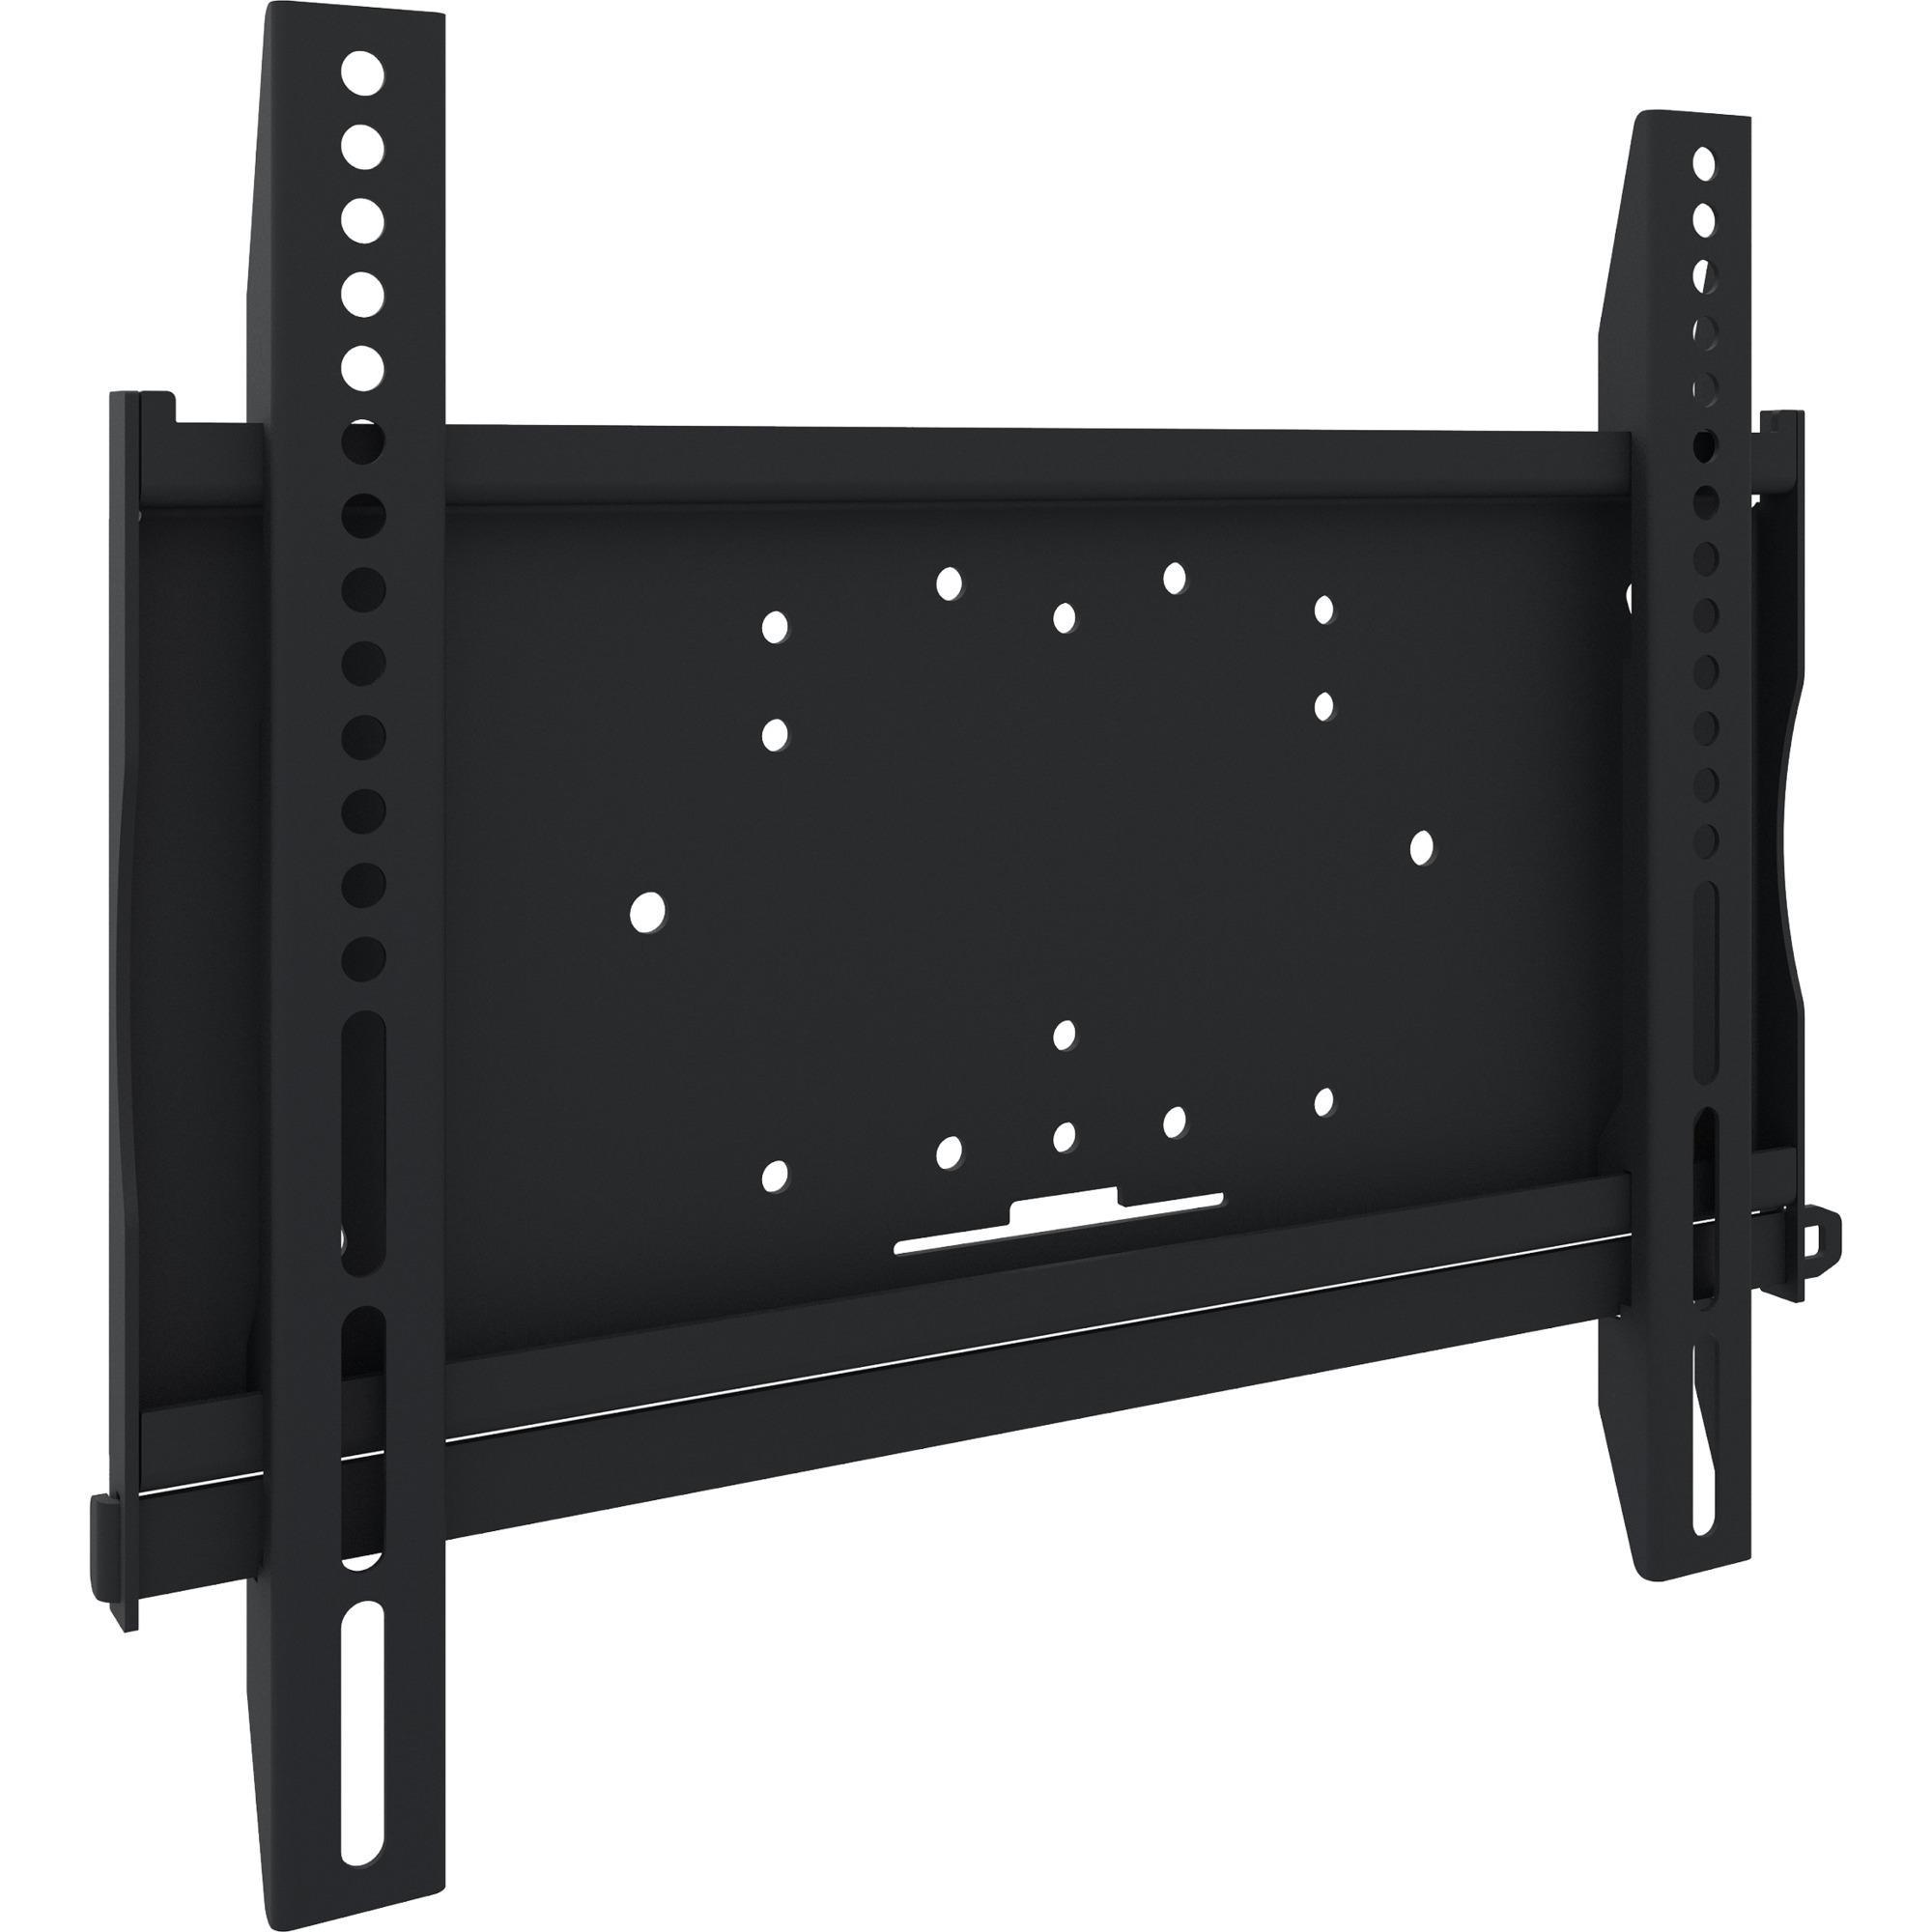 MD 052B1000 Negro soporte de pared para pantalla plana